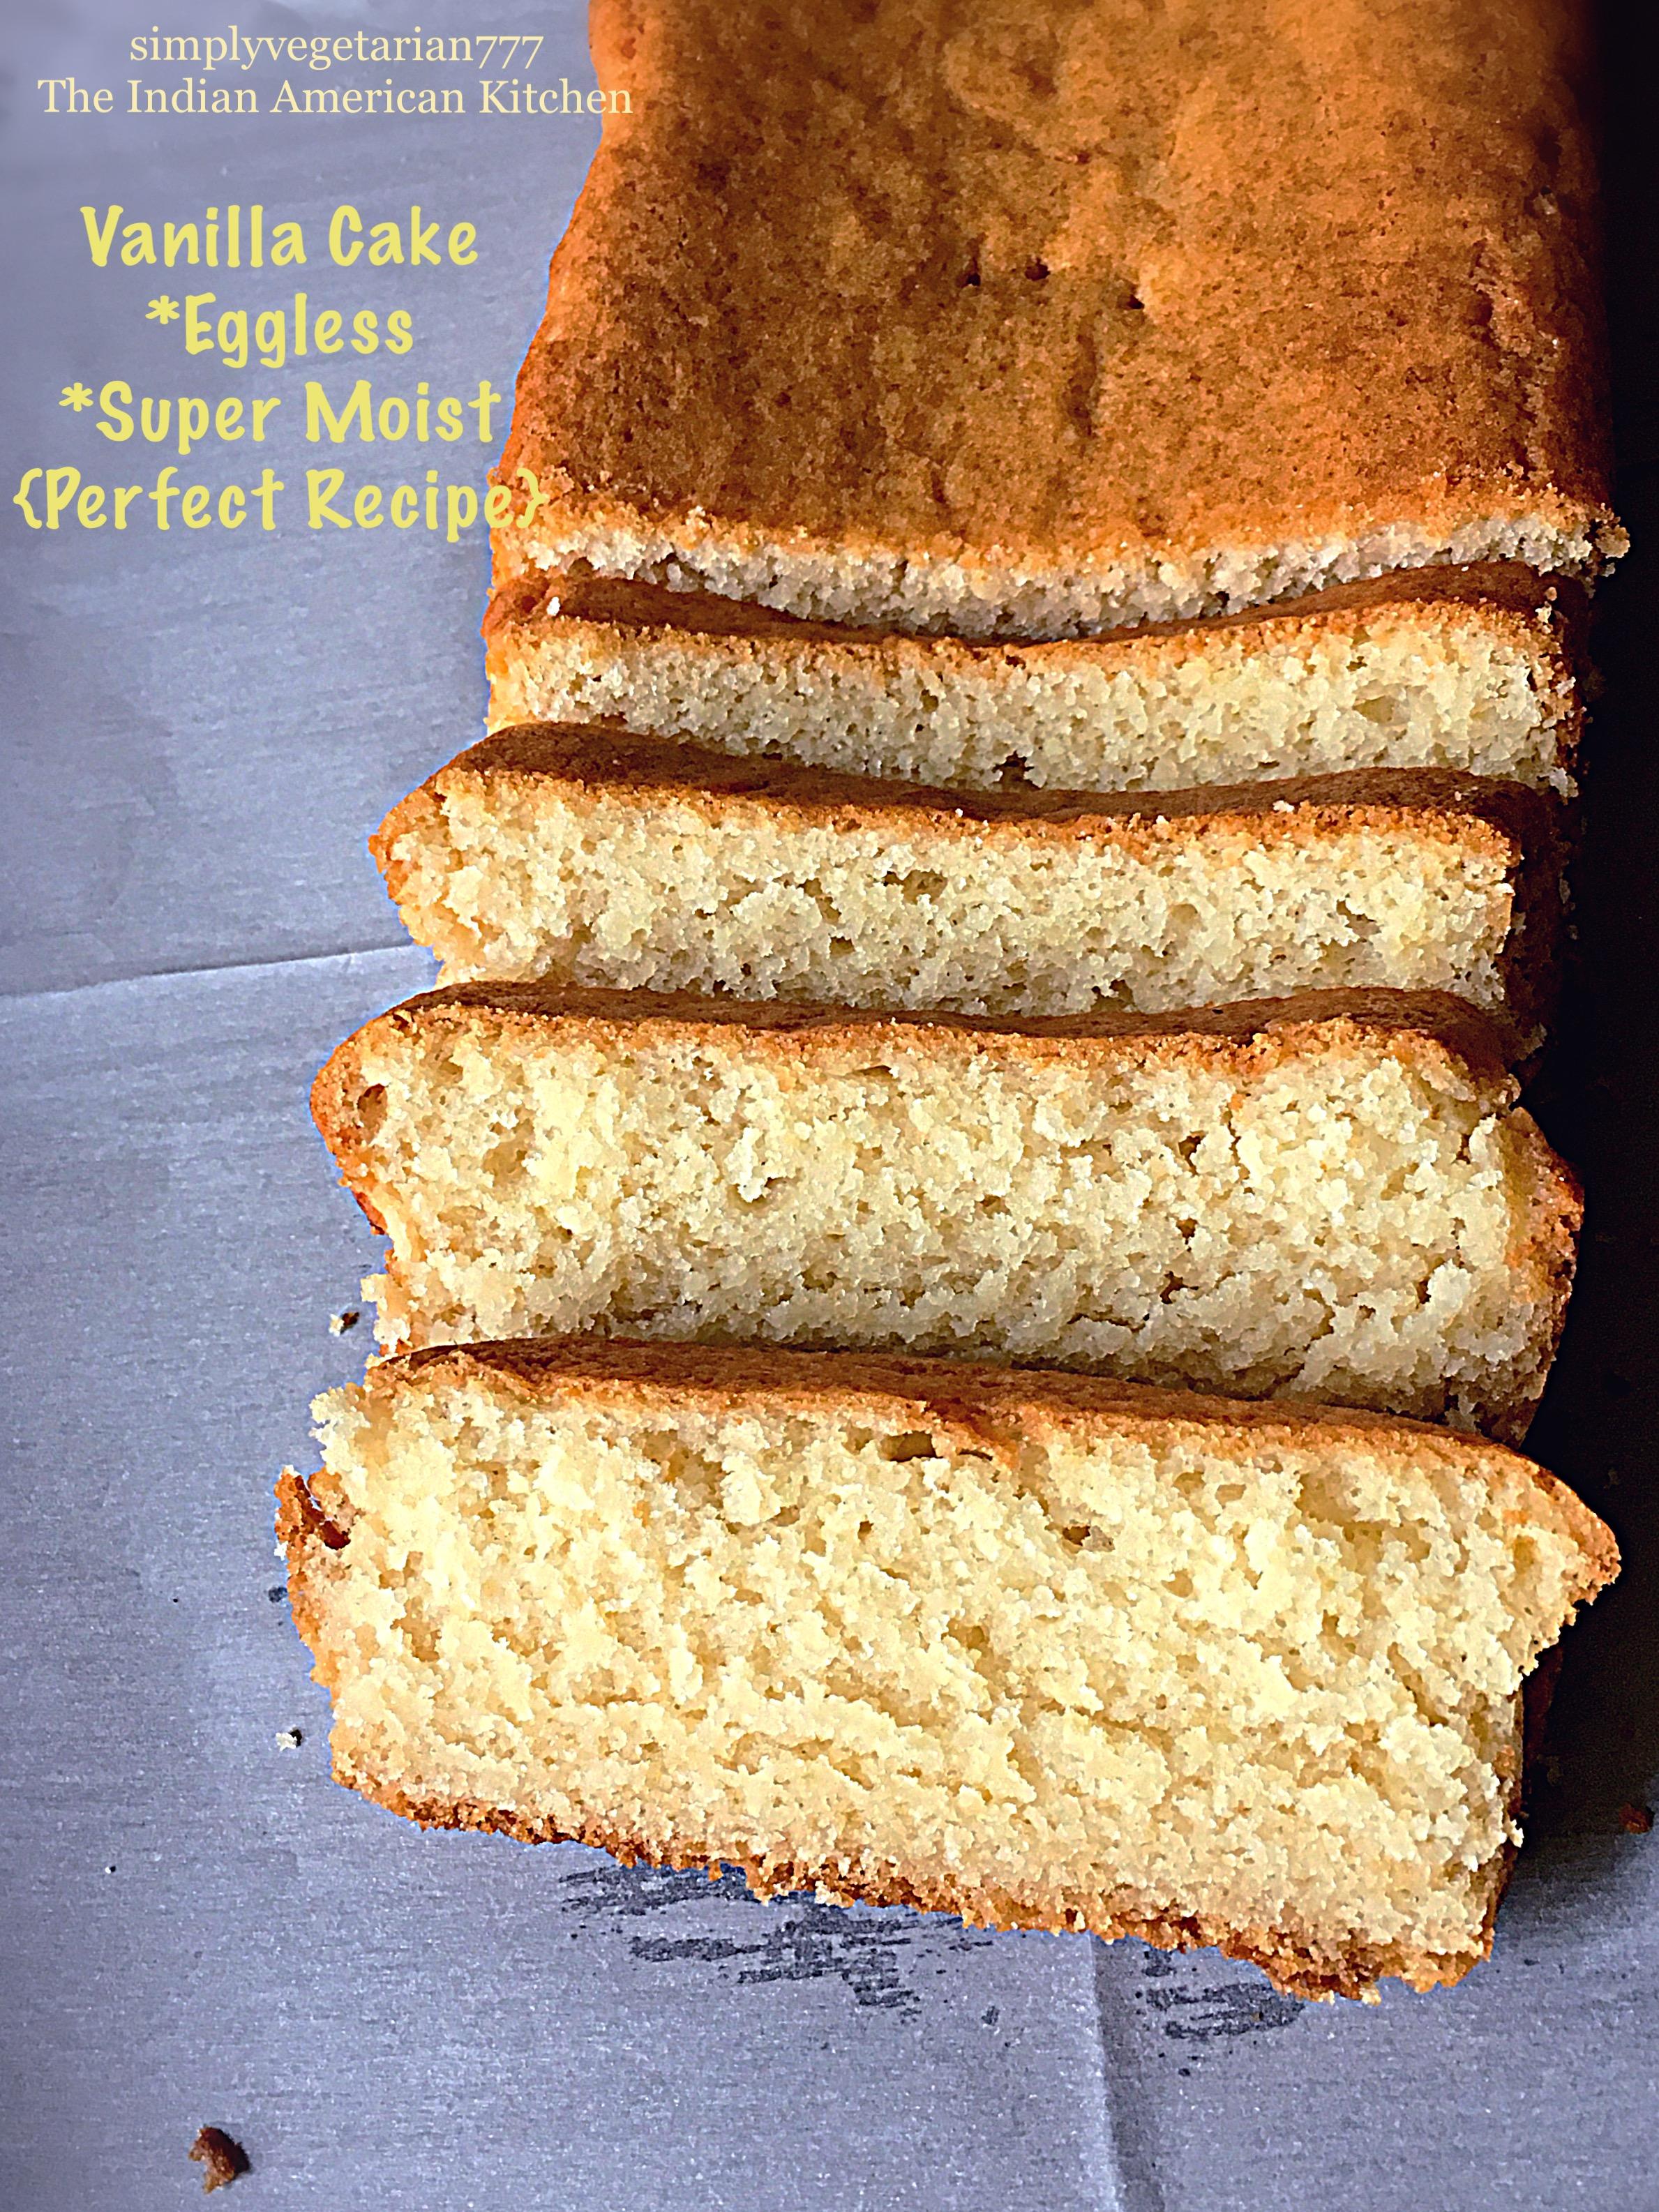 Basic Vanilla Cake Super Moist Eggless perfect recipe